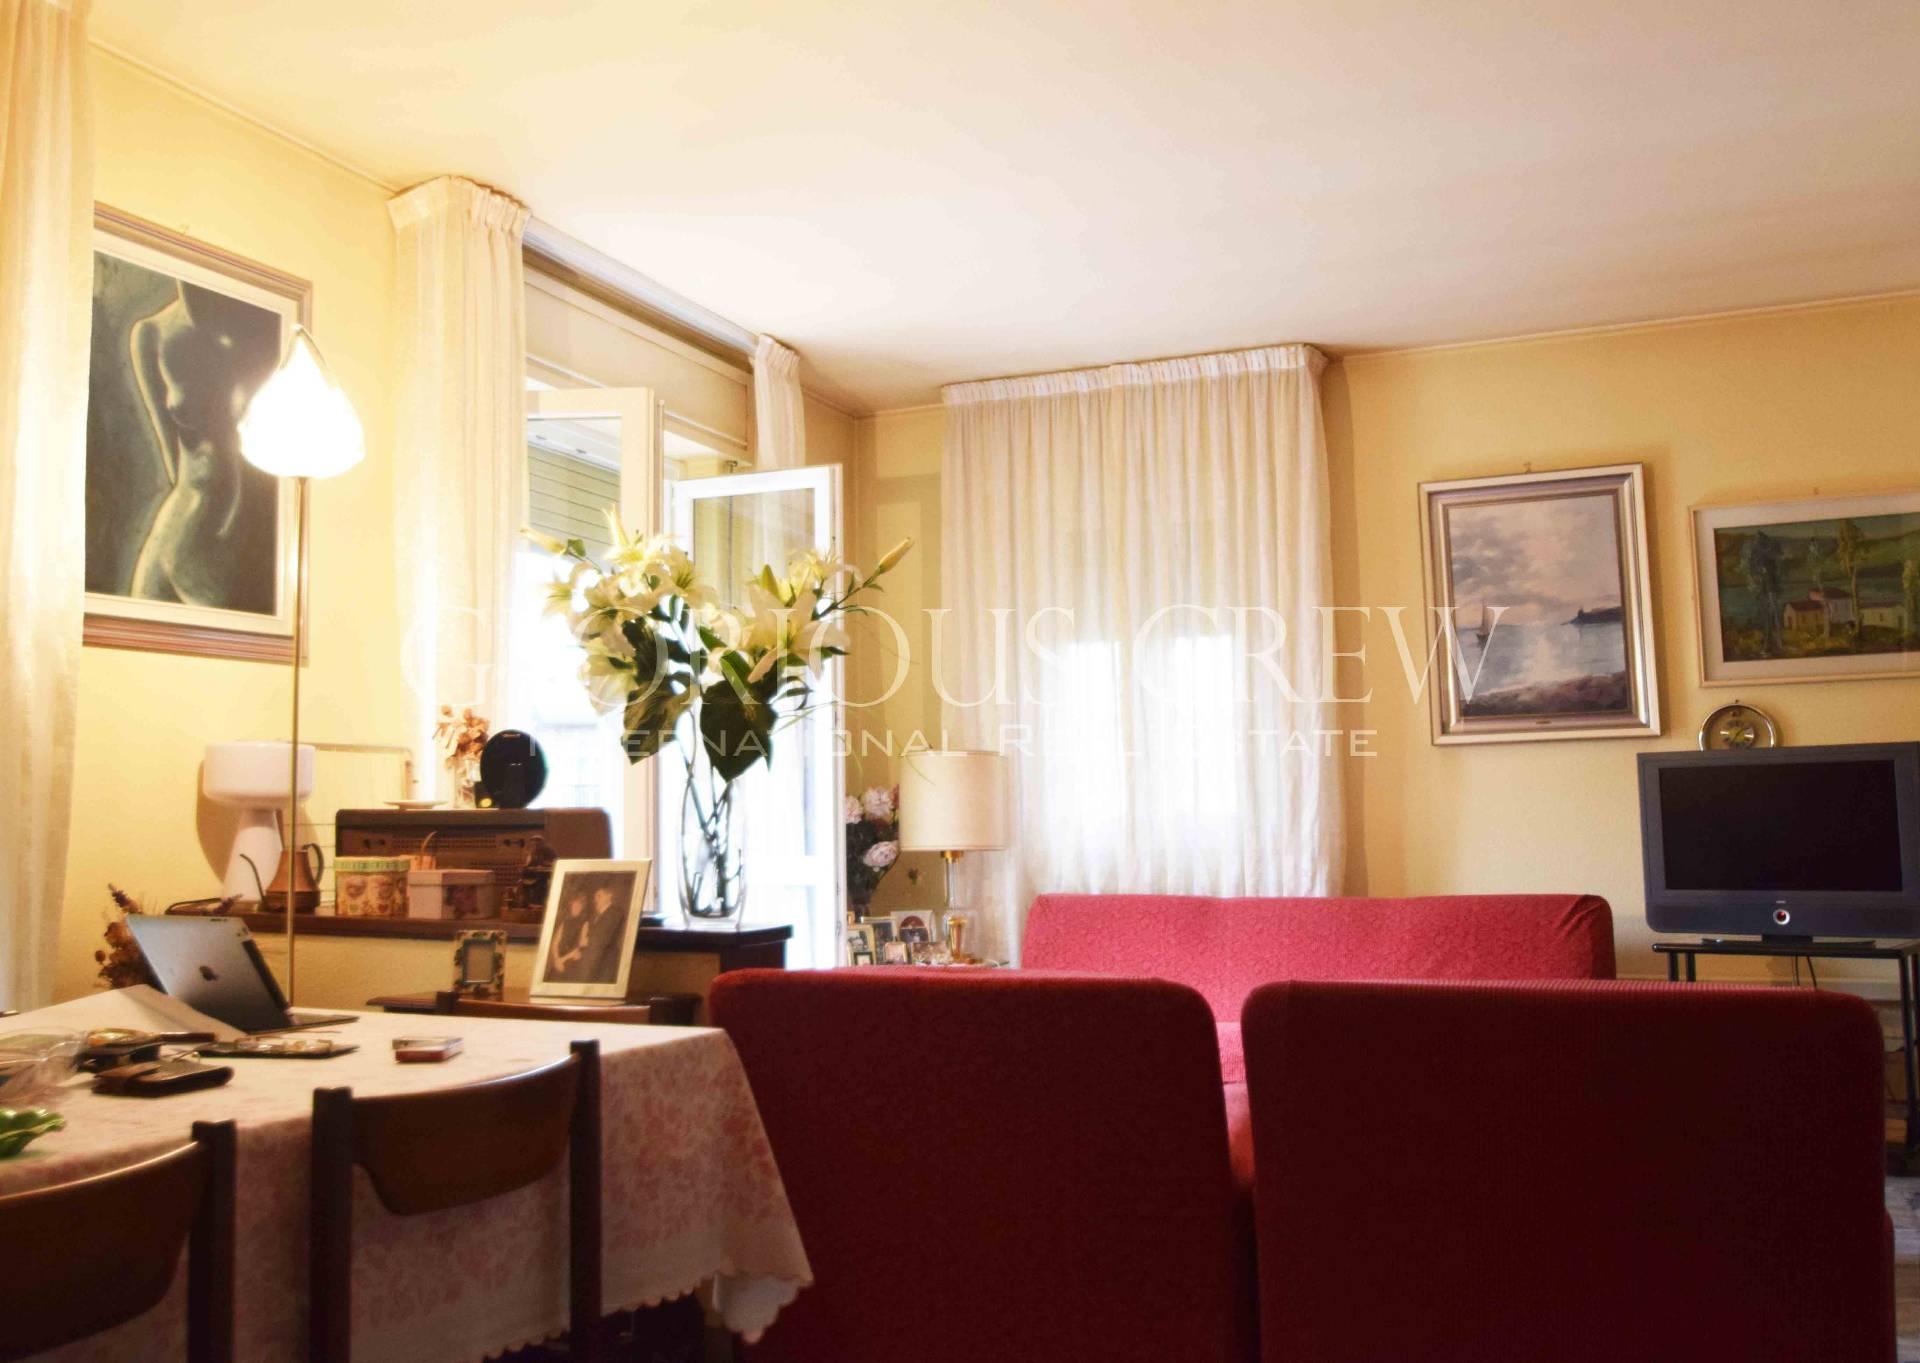 Milano | Appartamento in Vendita in Via Lanfranco Della Pila | lacasadimilano.it